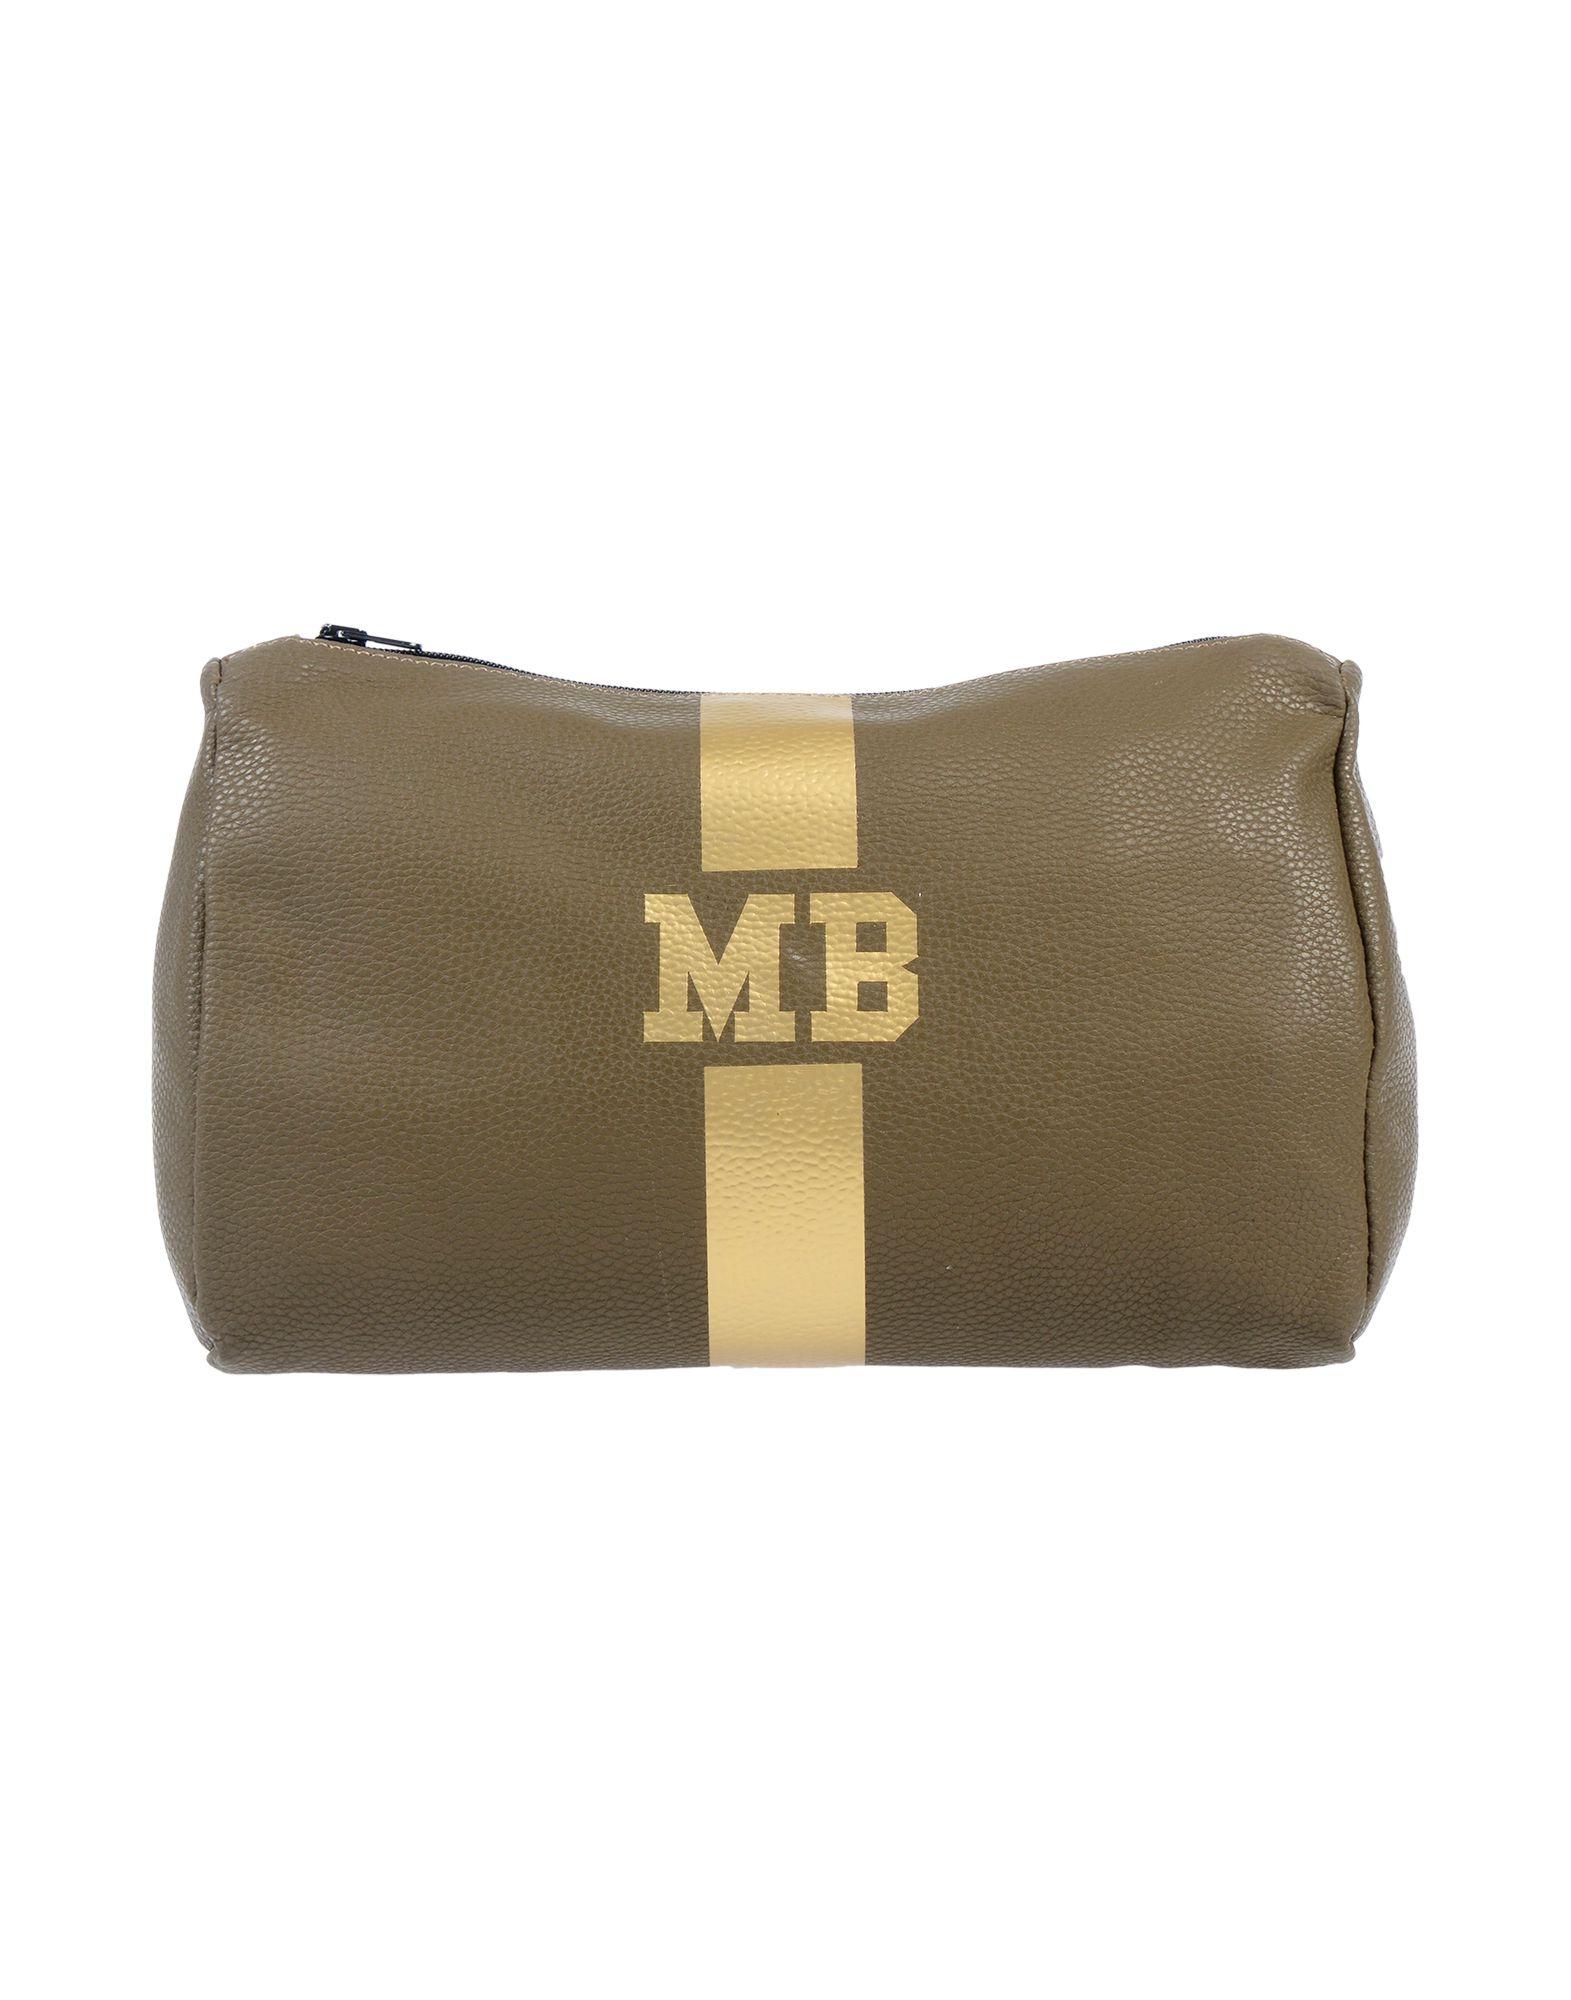 MIA BAG Beauty case gabs beauty case